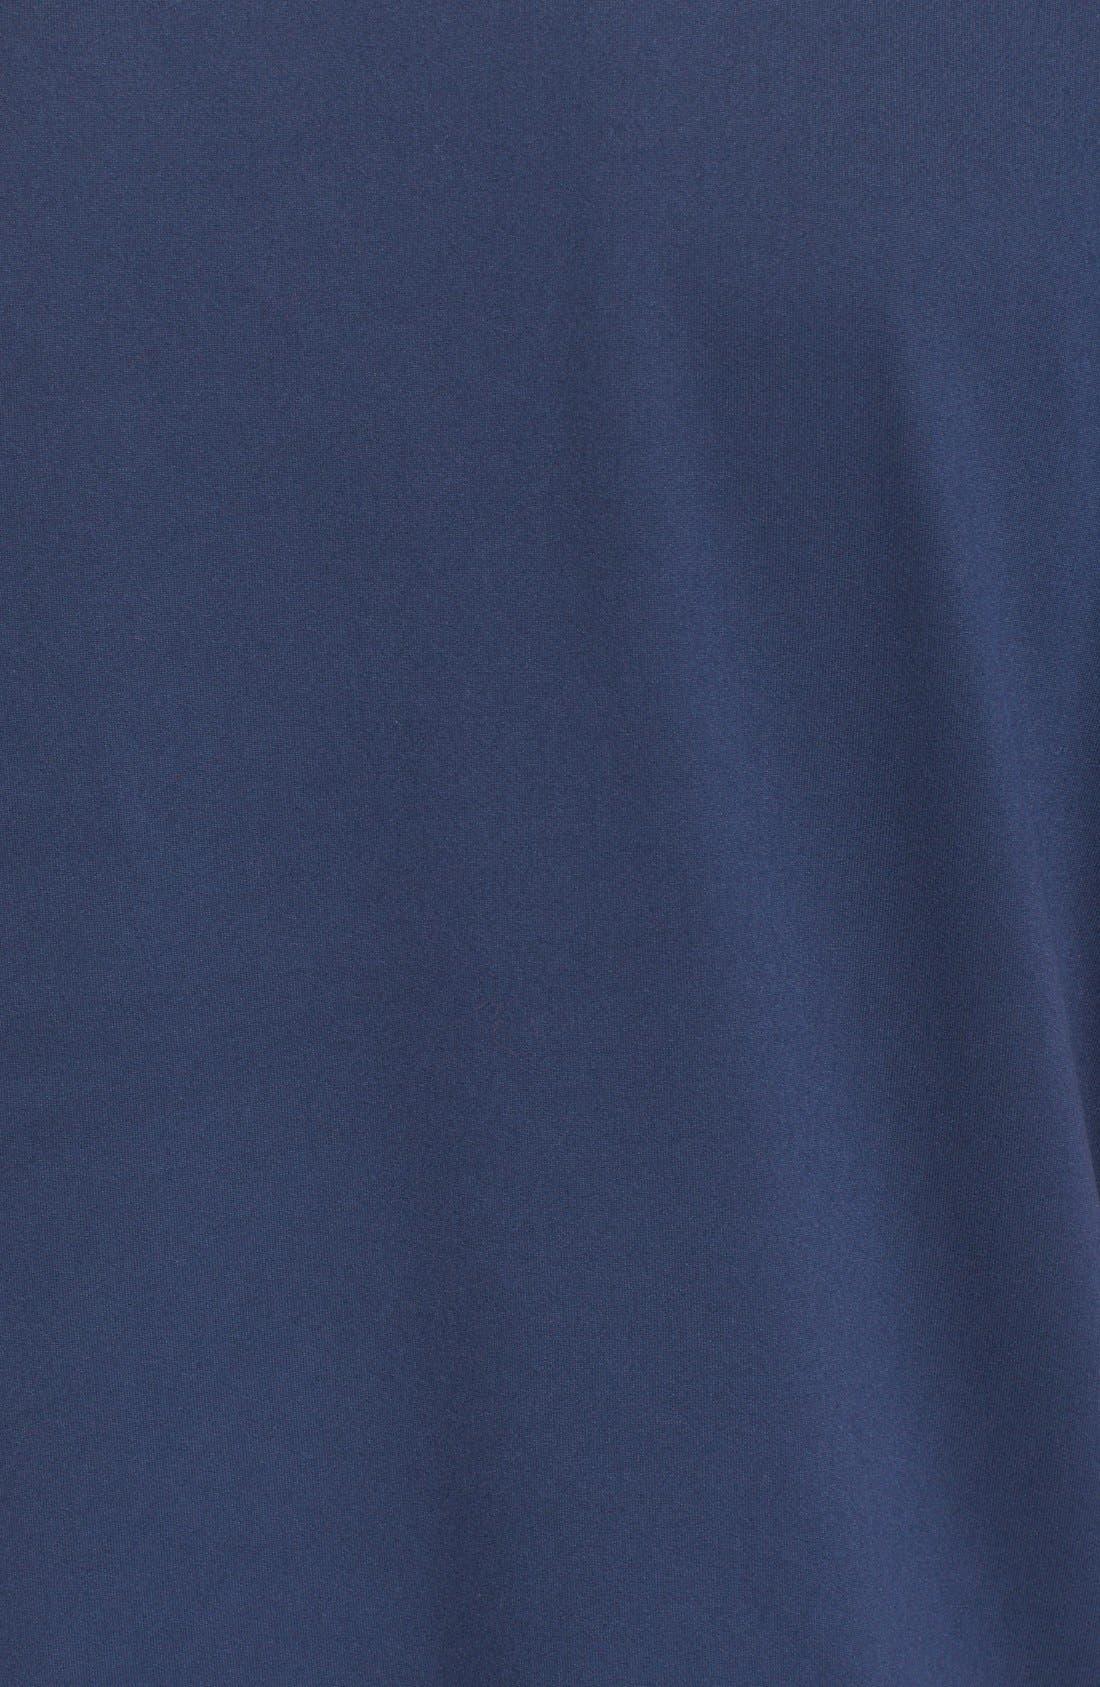 and Outdoor Voices 'Austin' Crewneck Logo T-Shirt,                             Alternate thumbnail 5, color,                             410